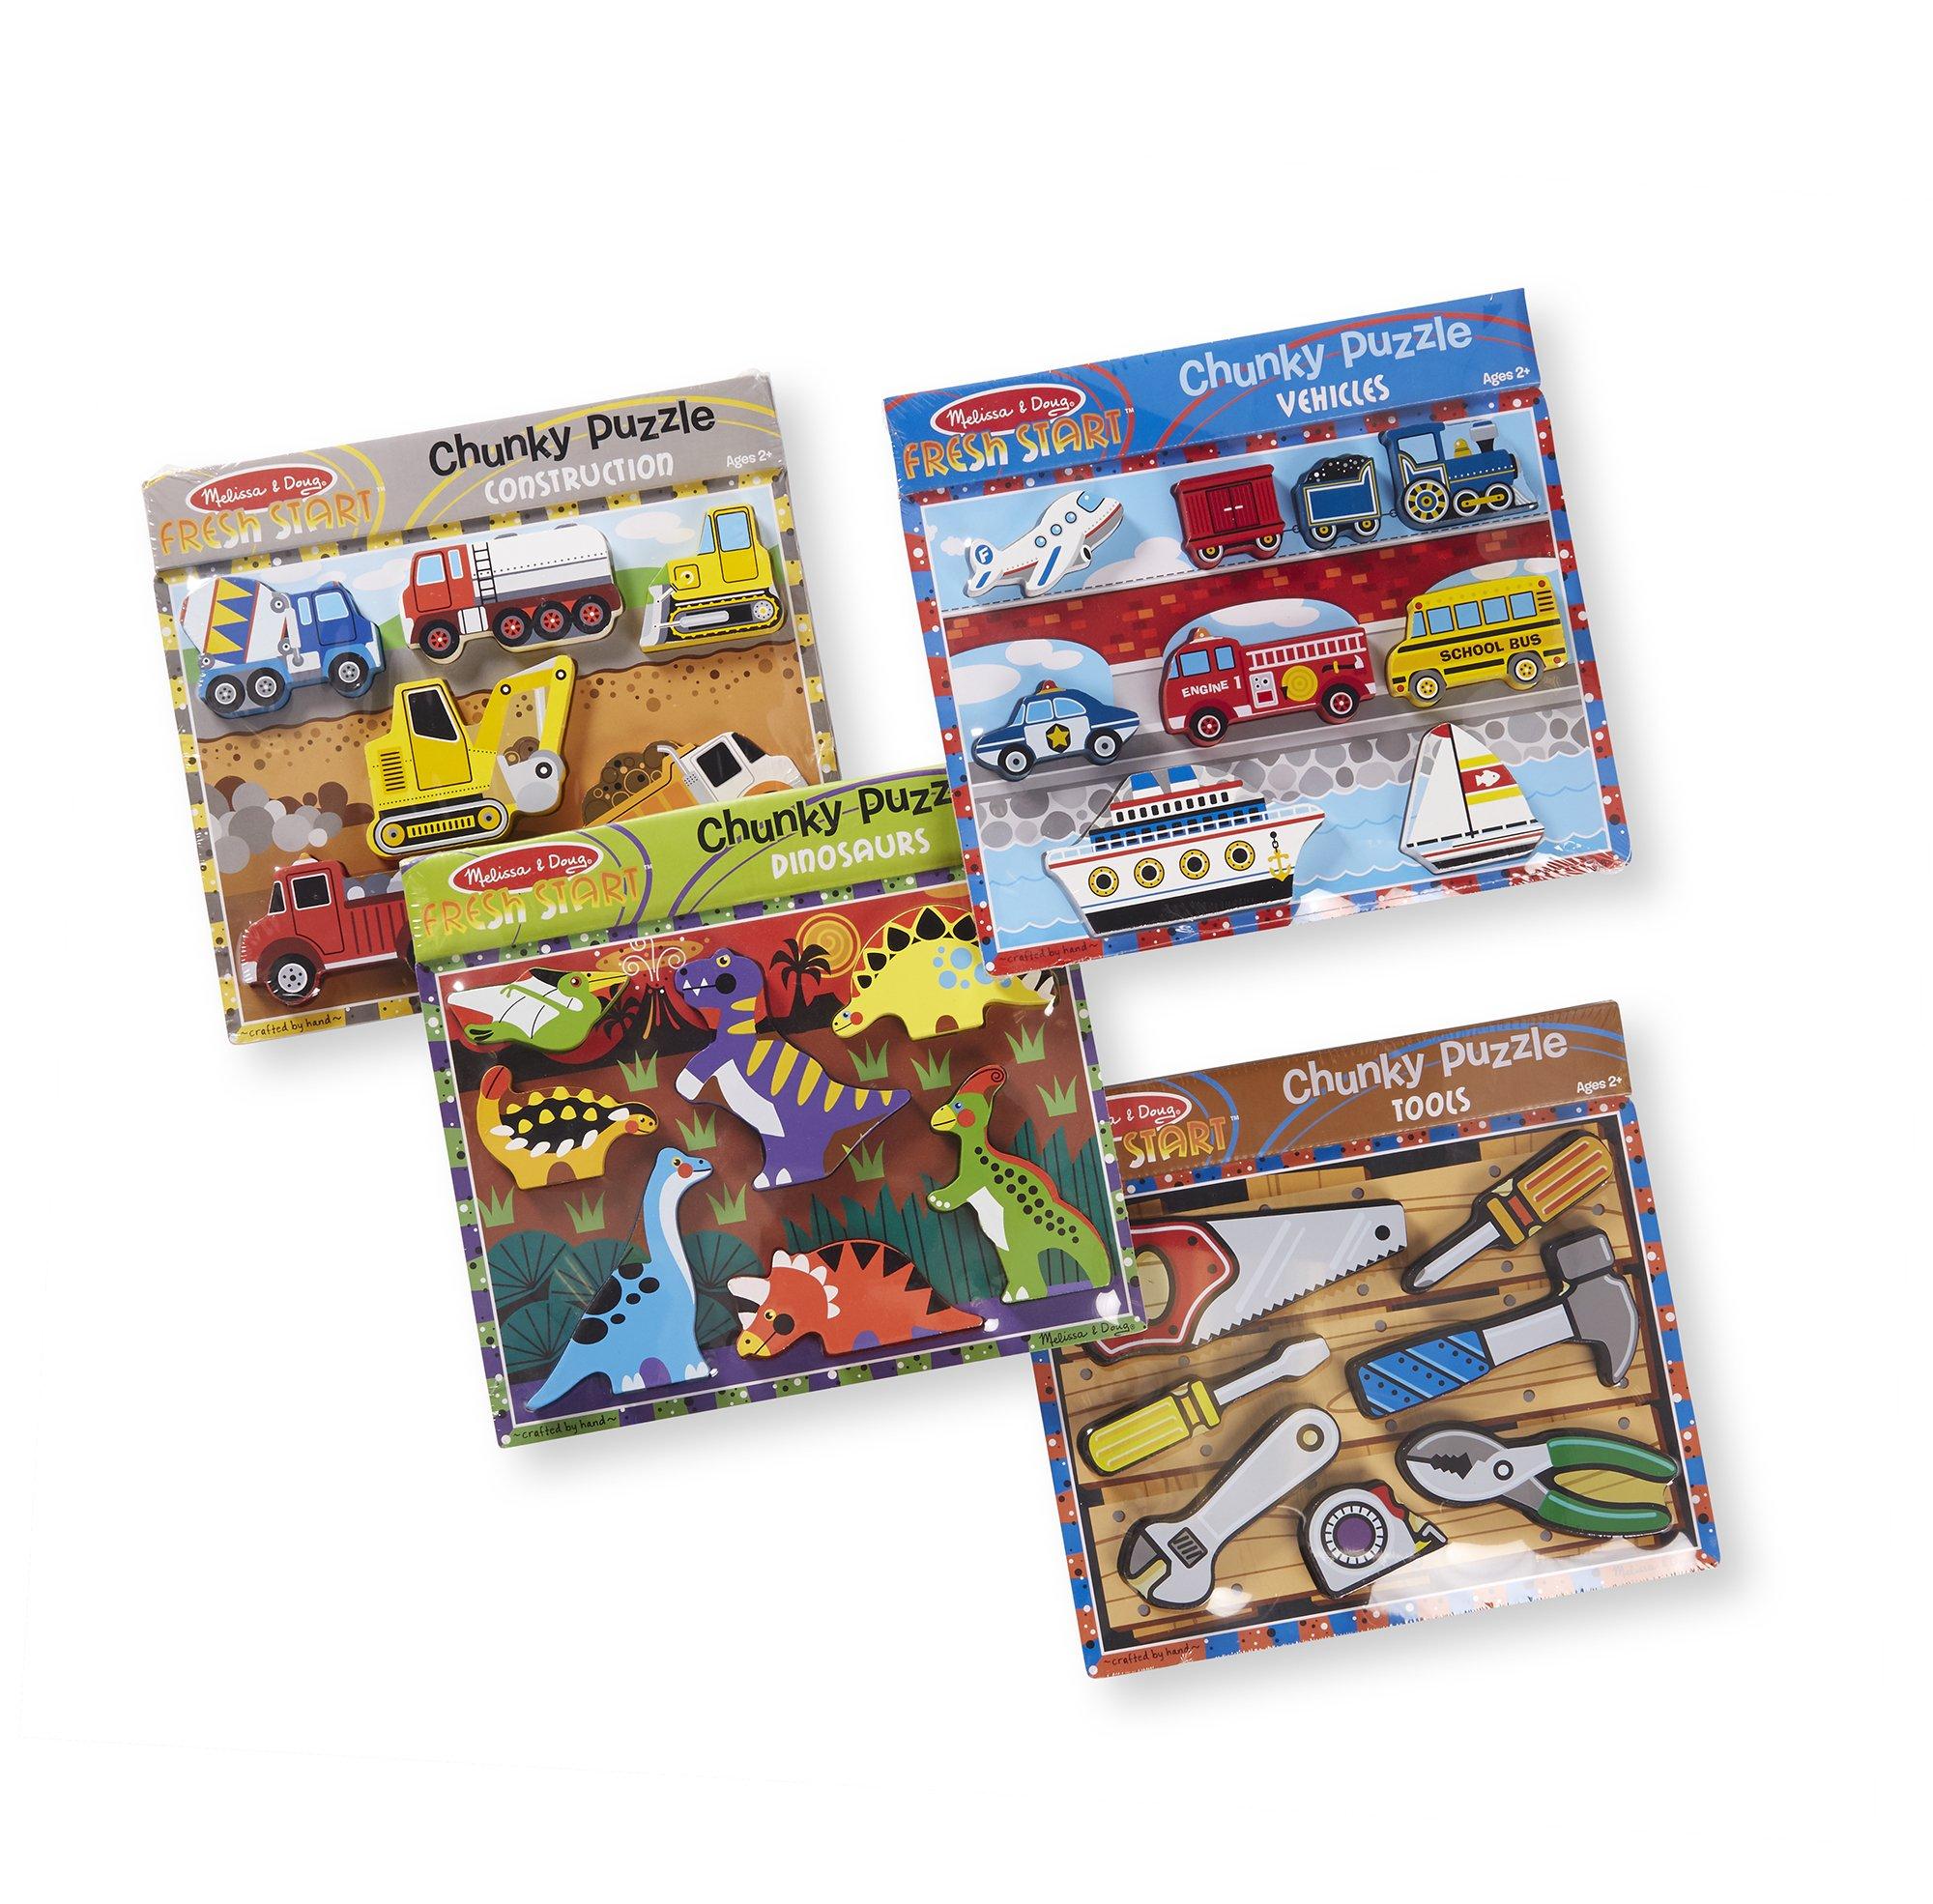 Melissa & Doug Chunky Wooden Puzzle Dinosaurs, Construction, Tools, Vehicles Puzzle by Melissa & Doug